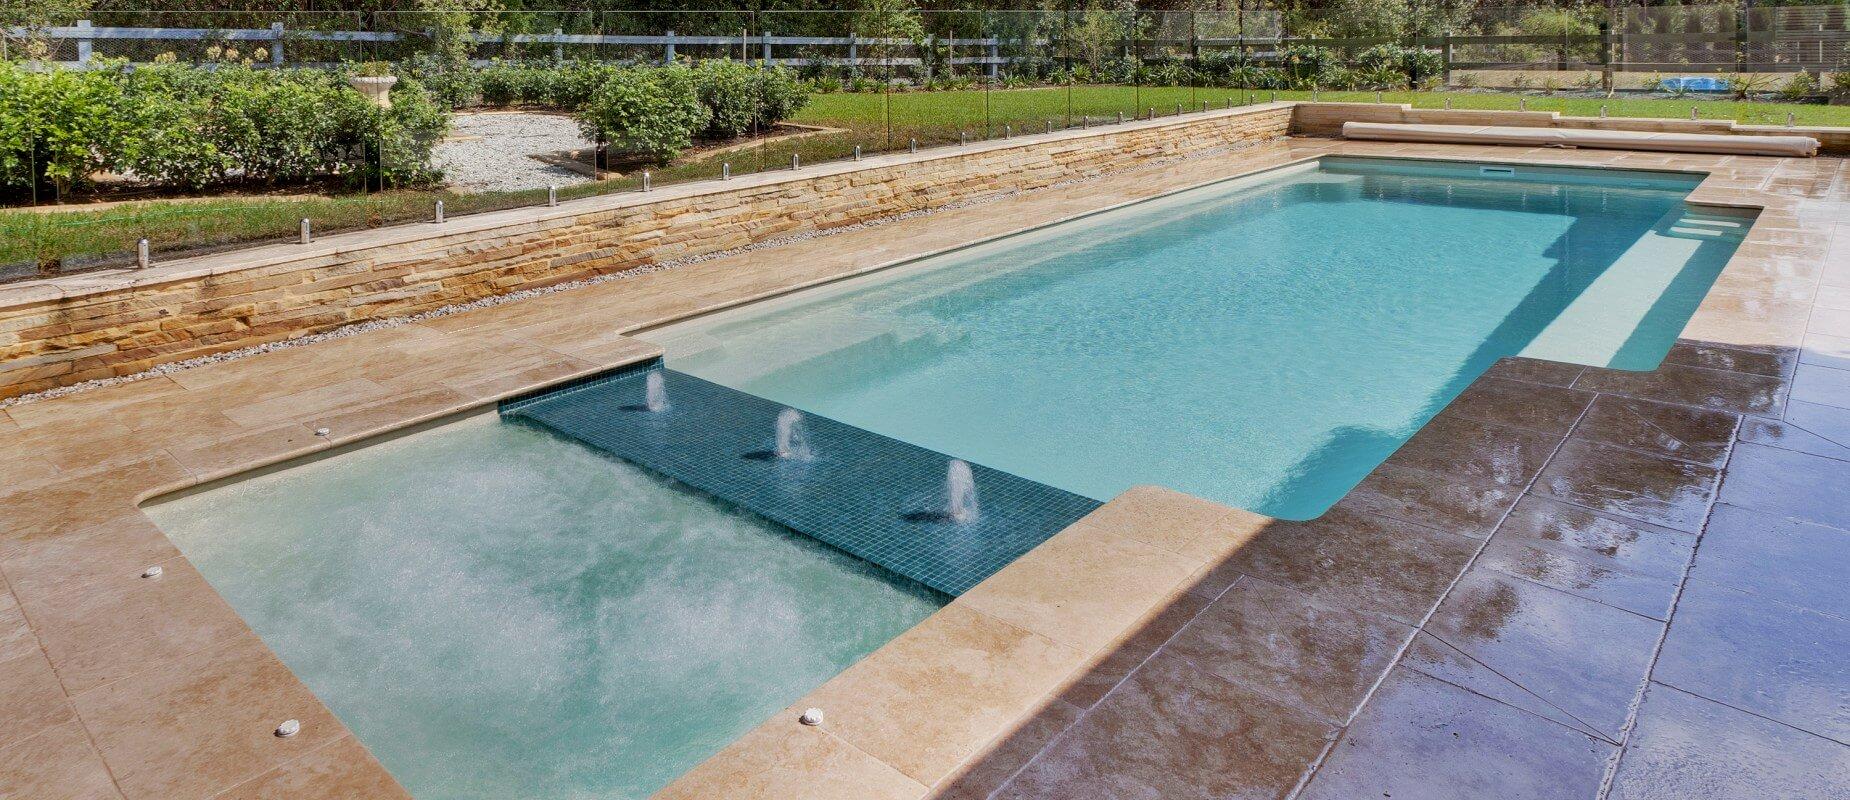 piscina de lux modele frumoase 35